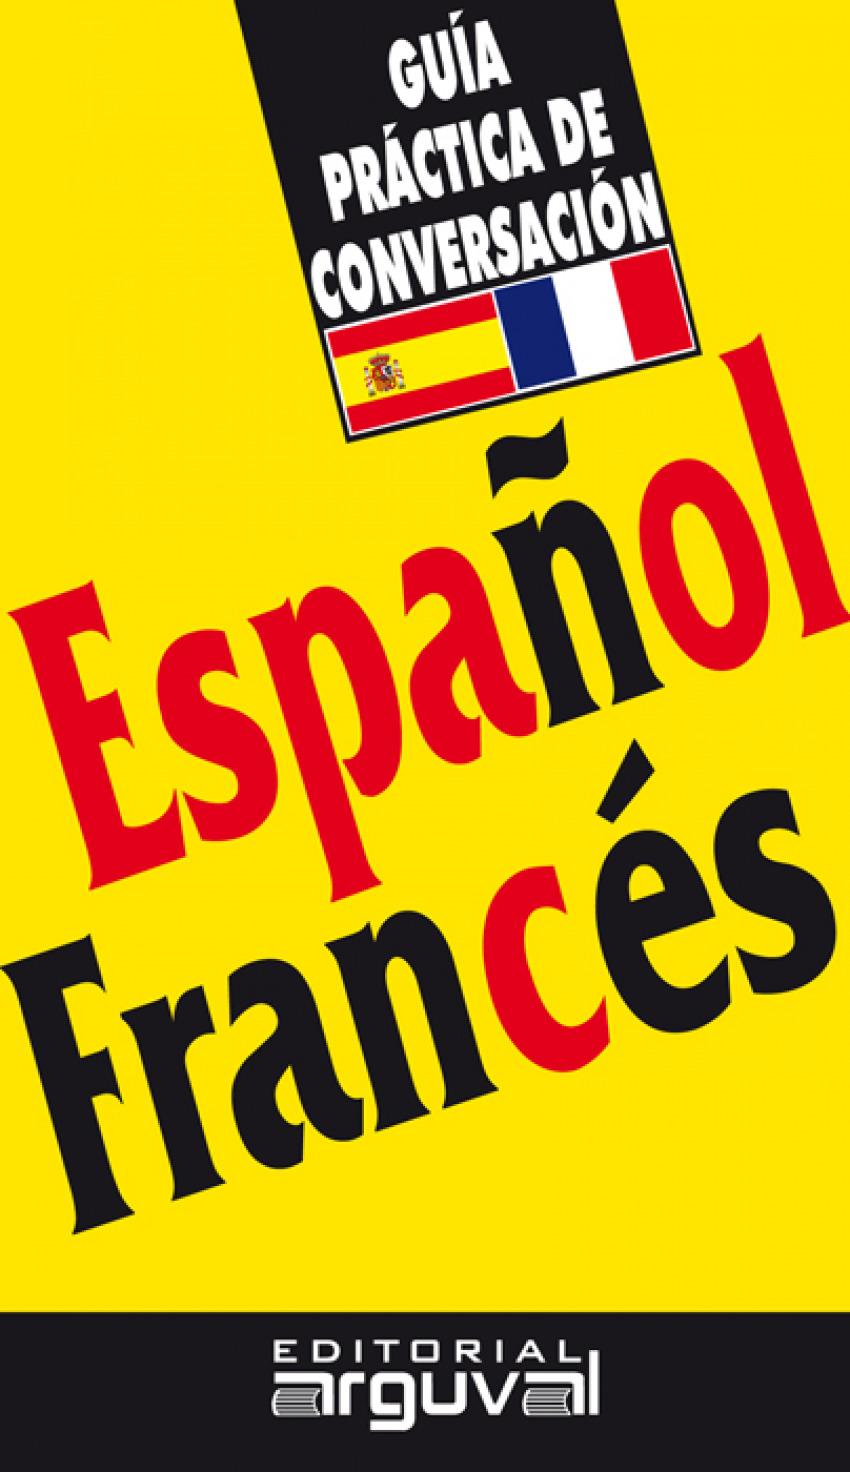 Guia practica de conversacion español-frances 9788489672154